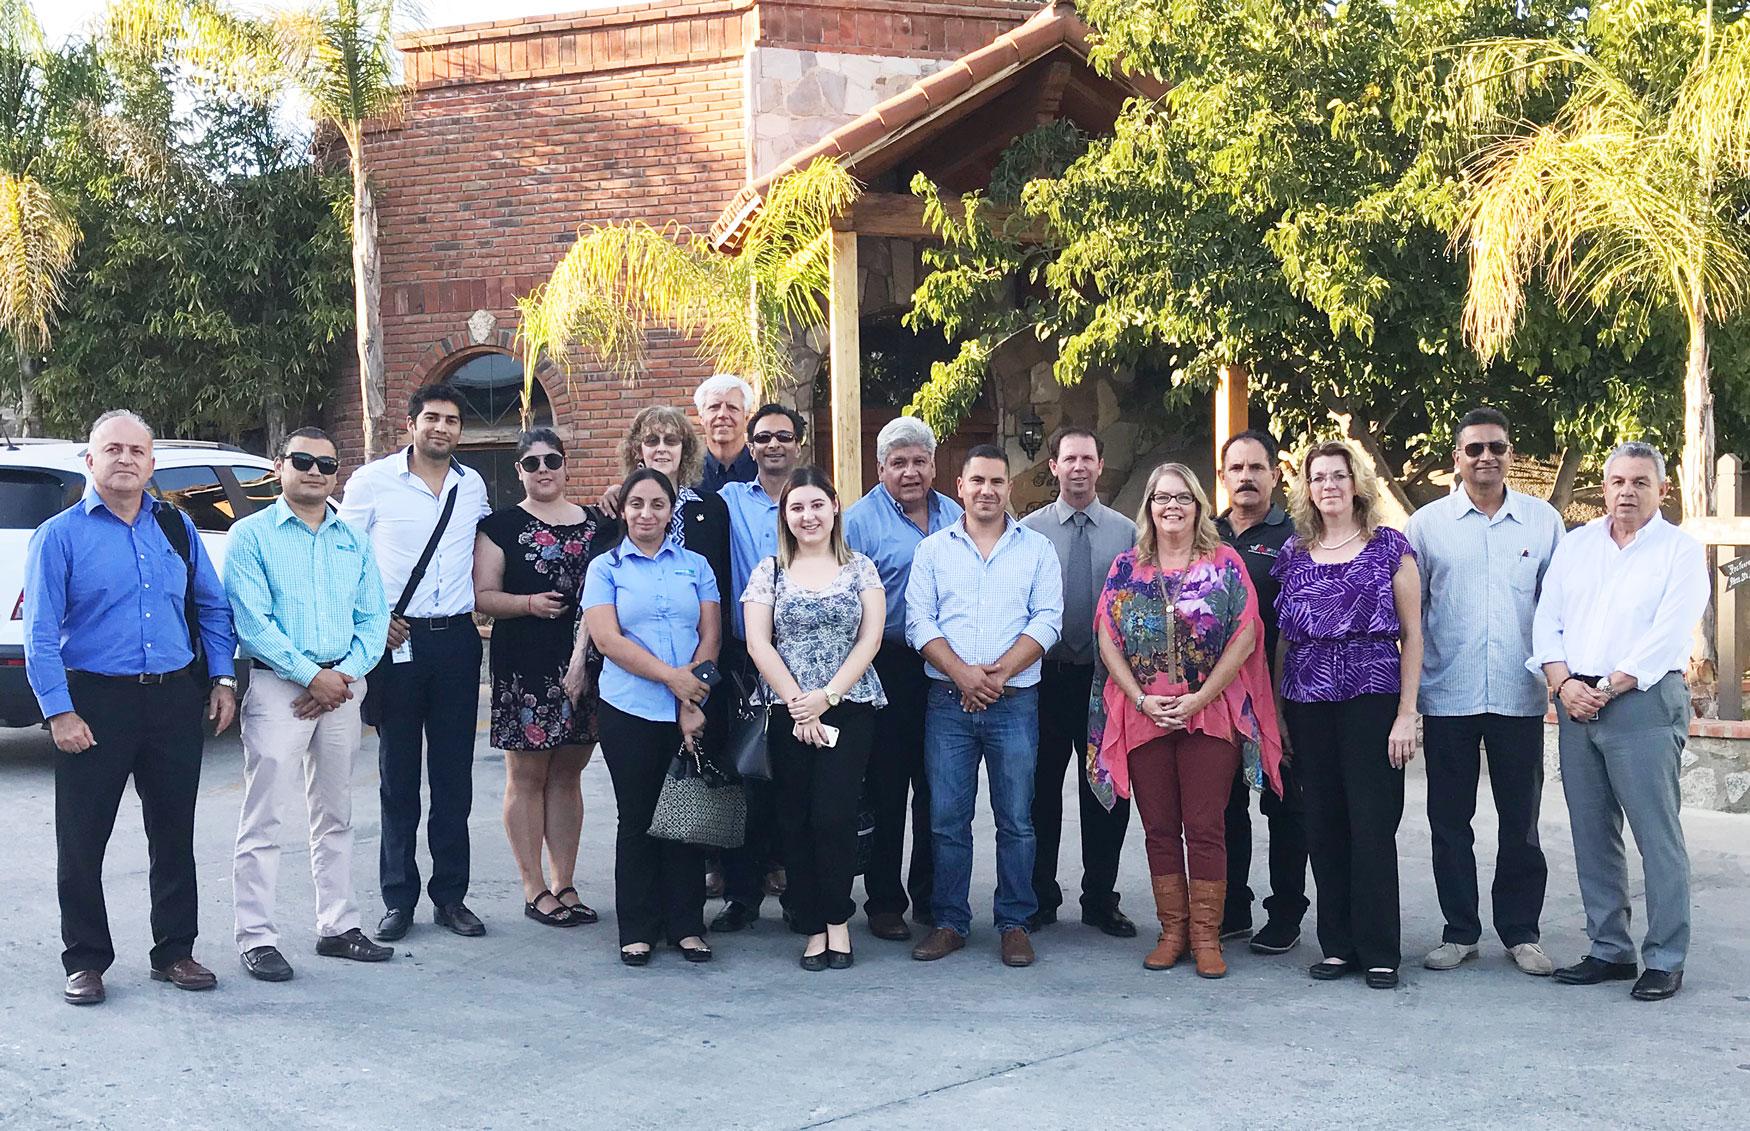 CMTC-Photo-Formula-Plastics-Tecate-Baja-Ind-Supplier-Trade-Tour-10-18-2017-cropped-reduced-lightened.jpg